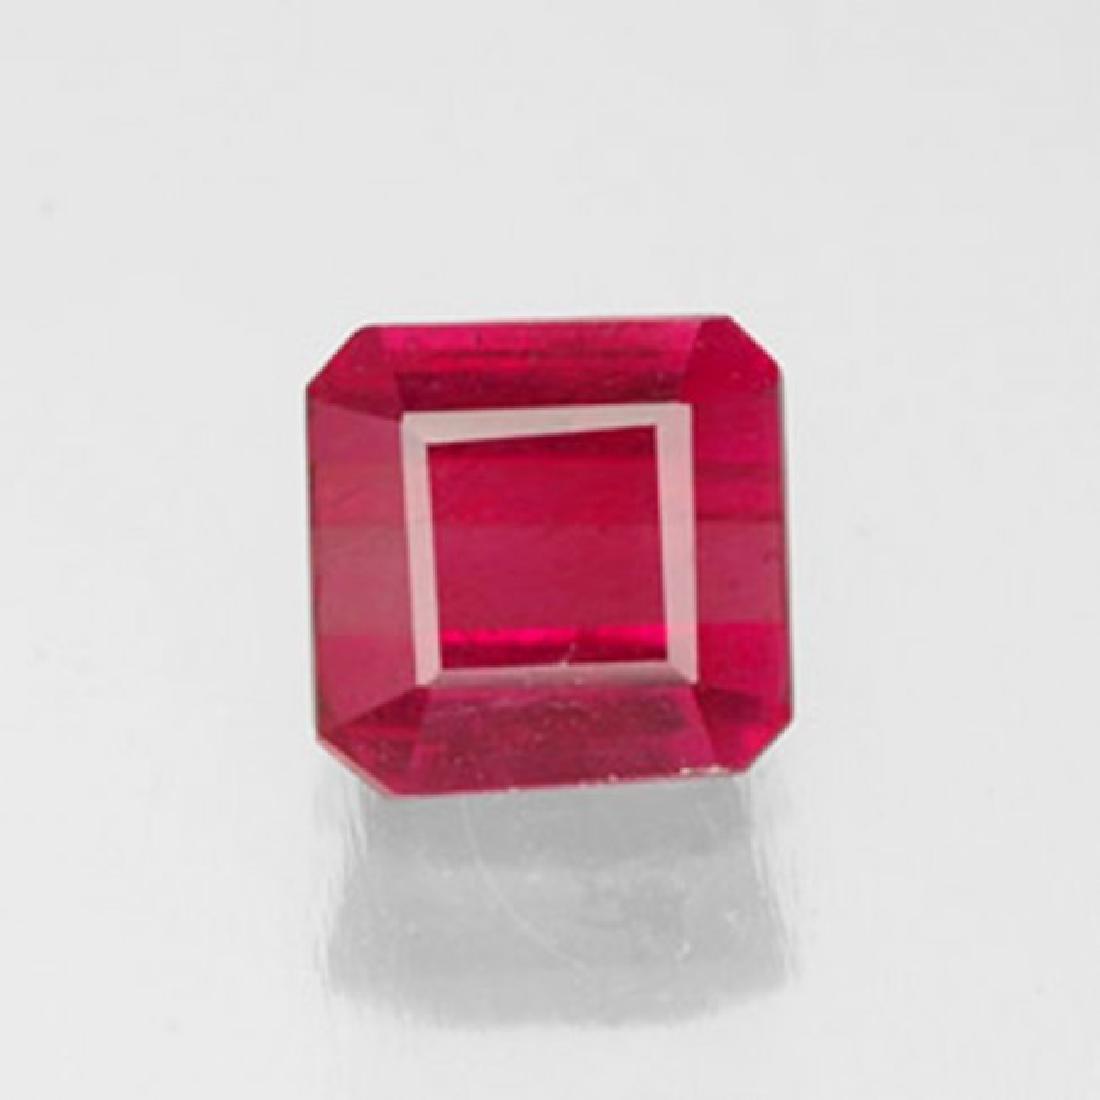 Natural Ruby Cushion Facet 1..49Ct 6.2x6x3.9 mm